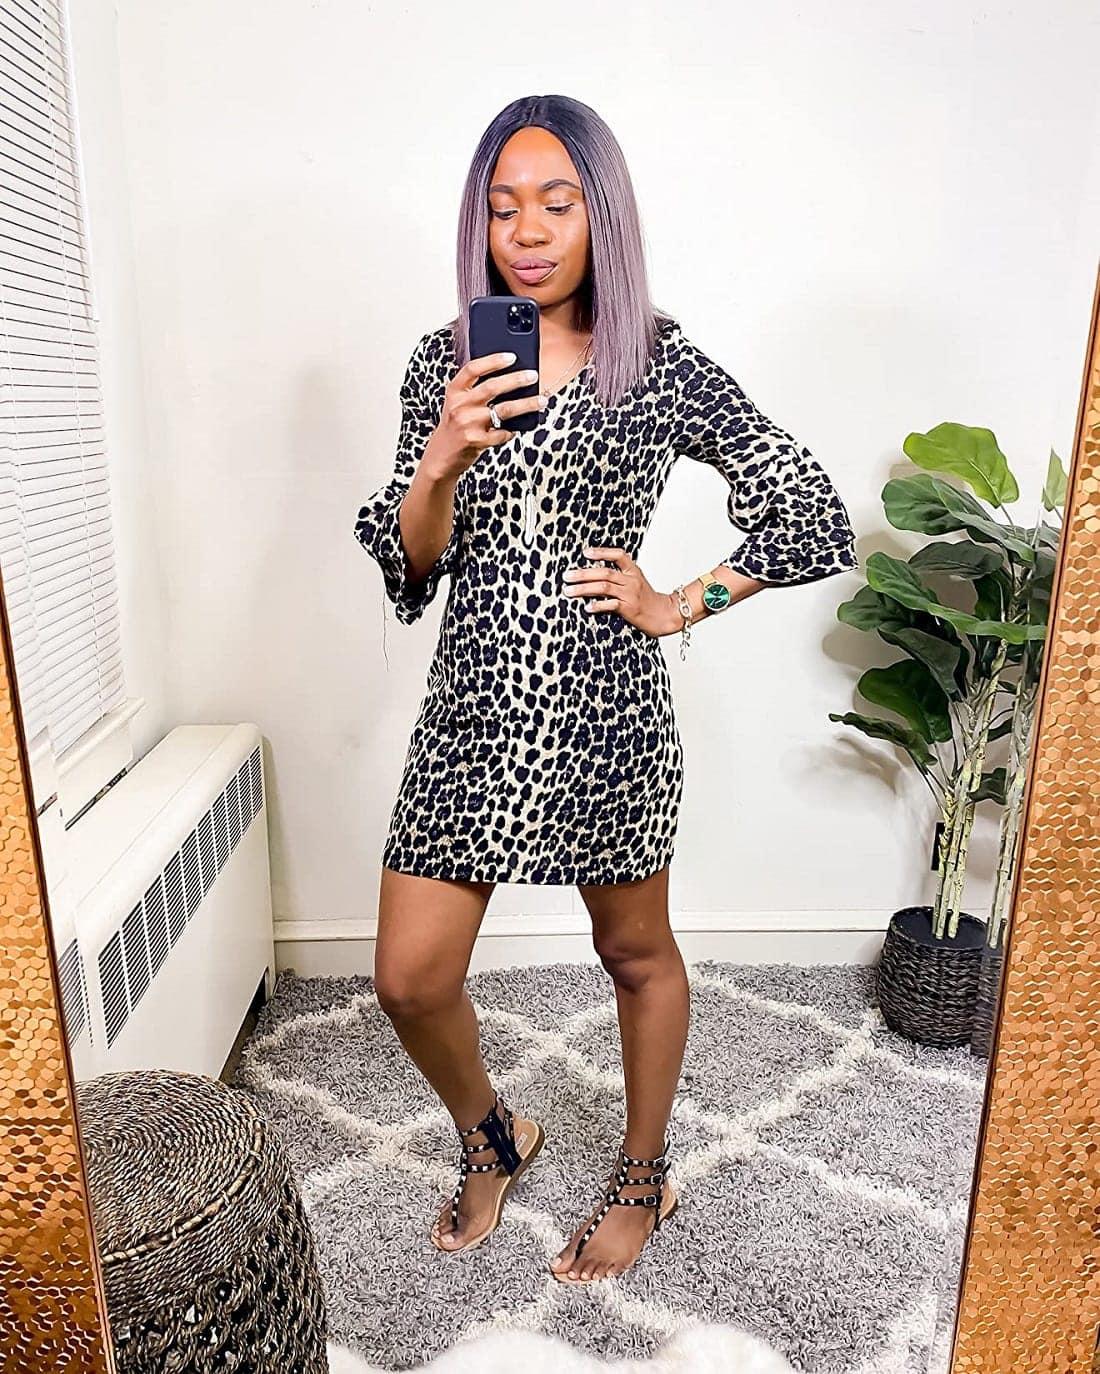 A bestseller leopard print short dress from Amazon dress haul collection